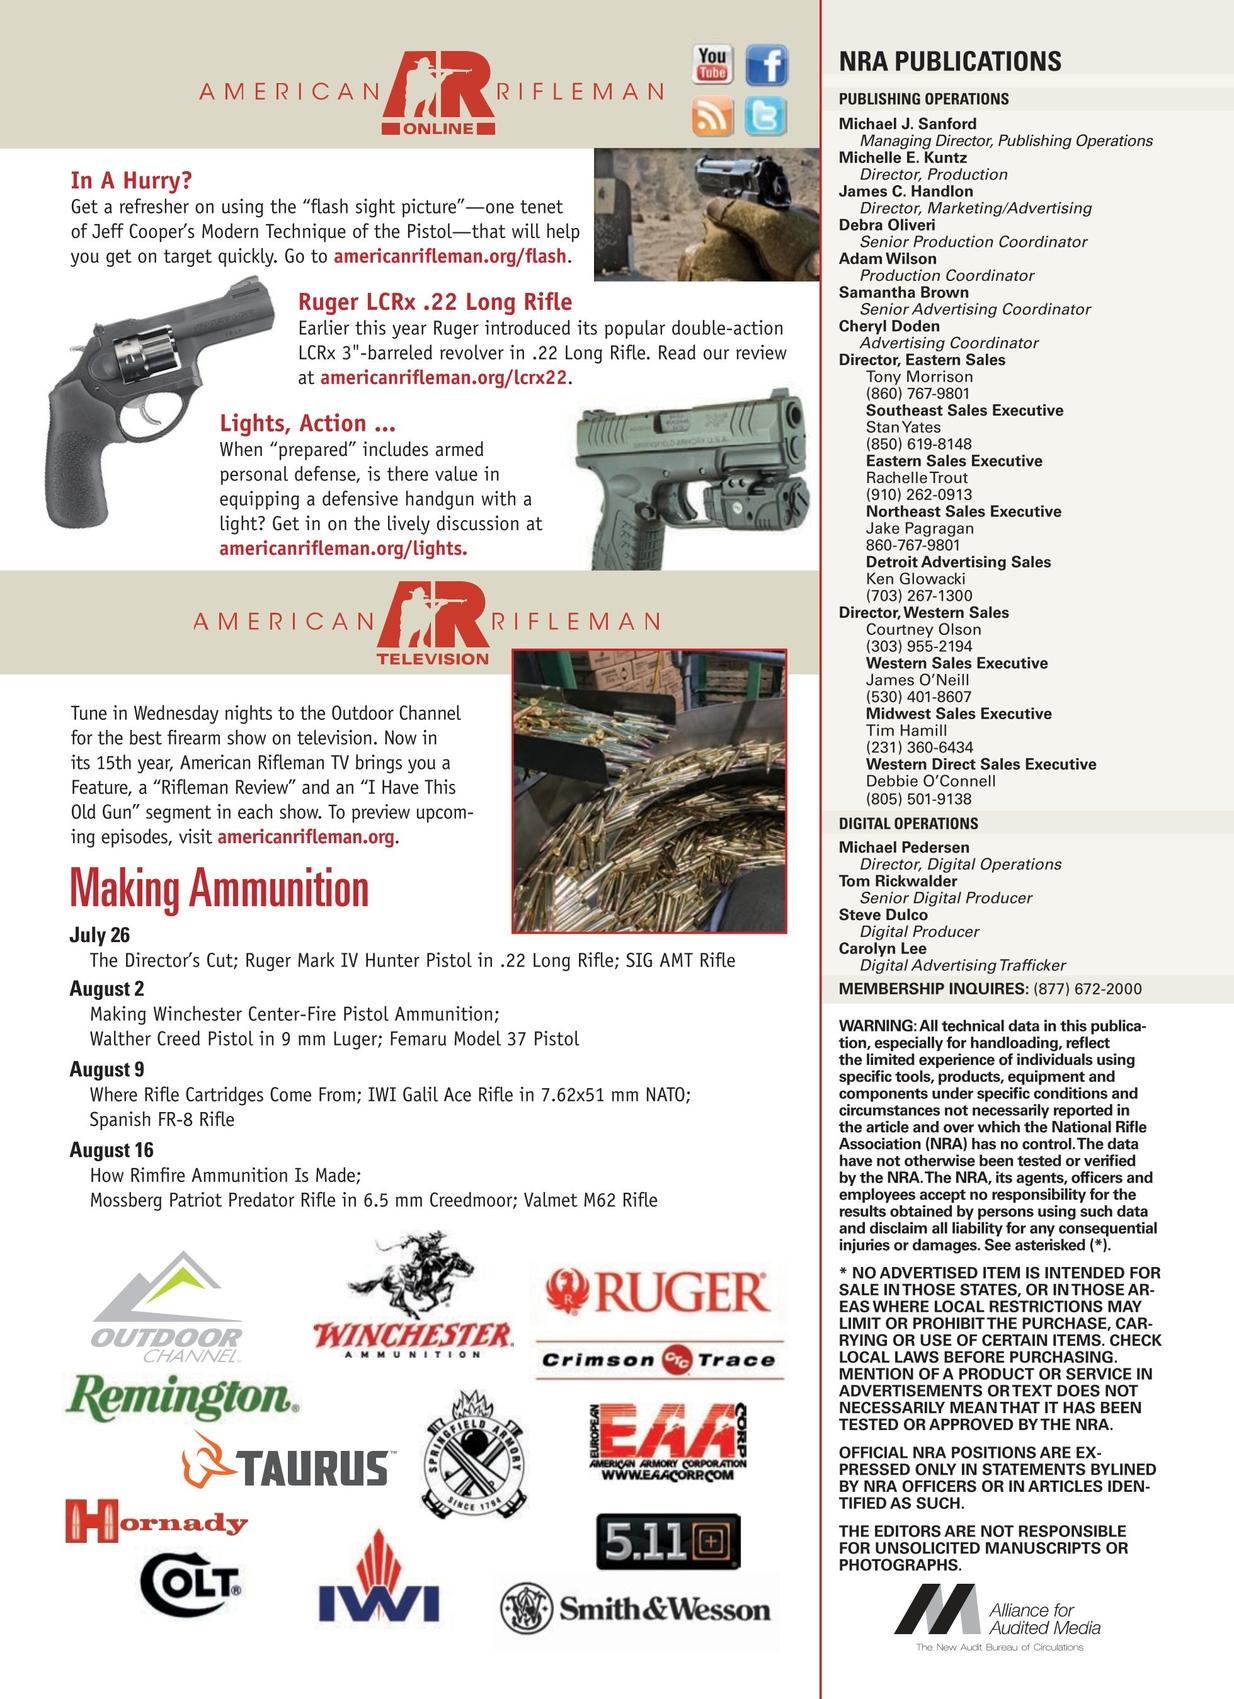 American Rifleman - August 2017